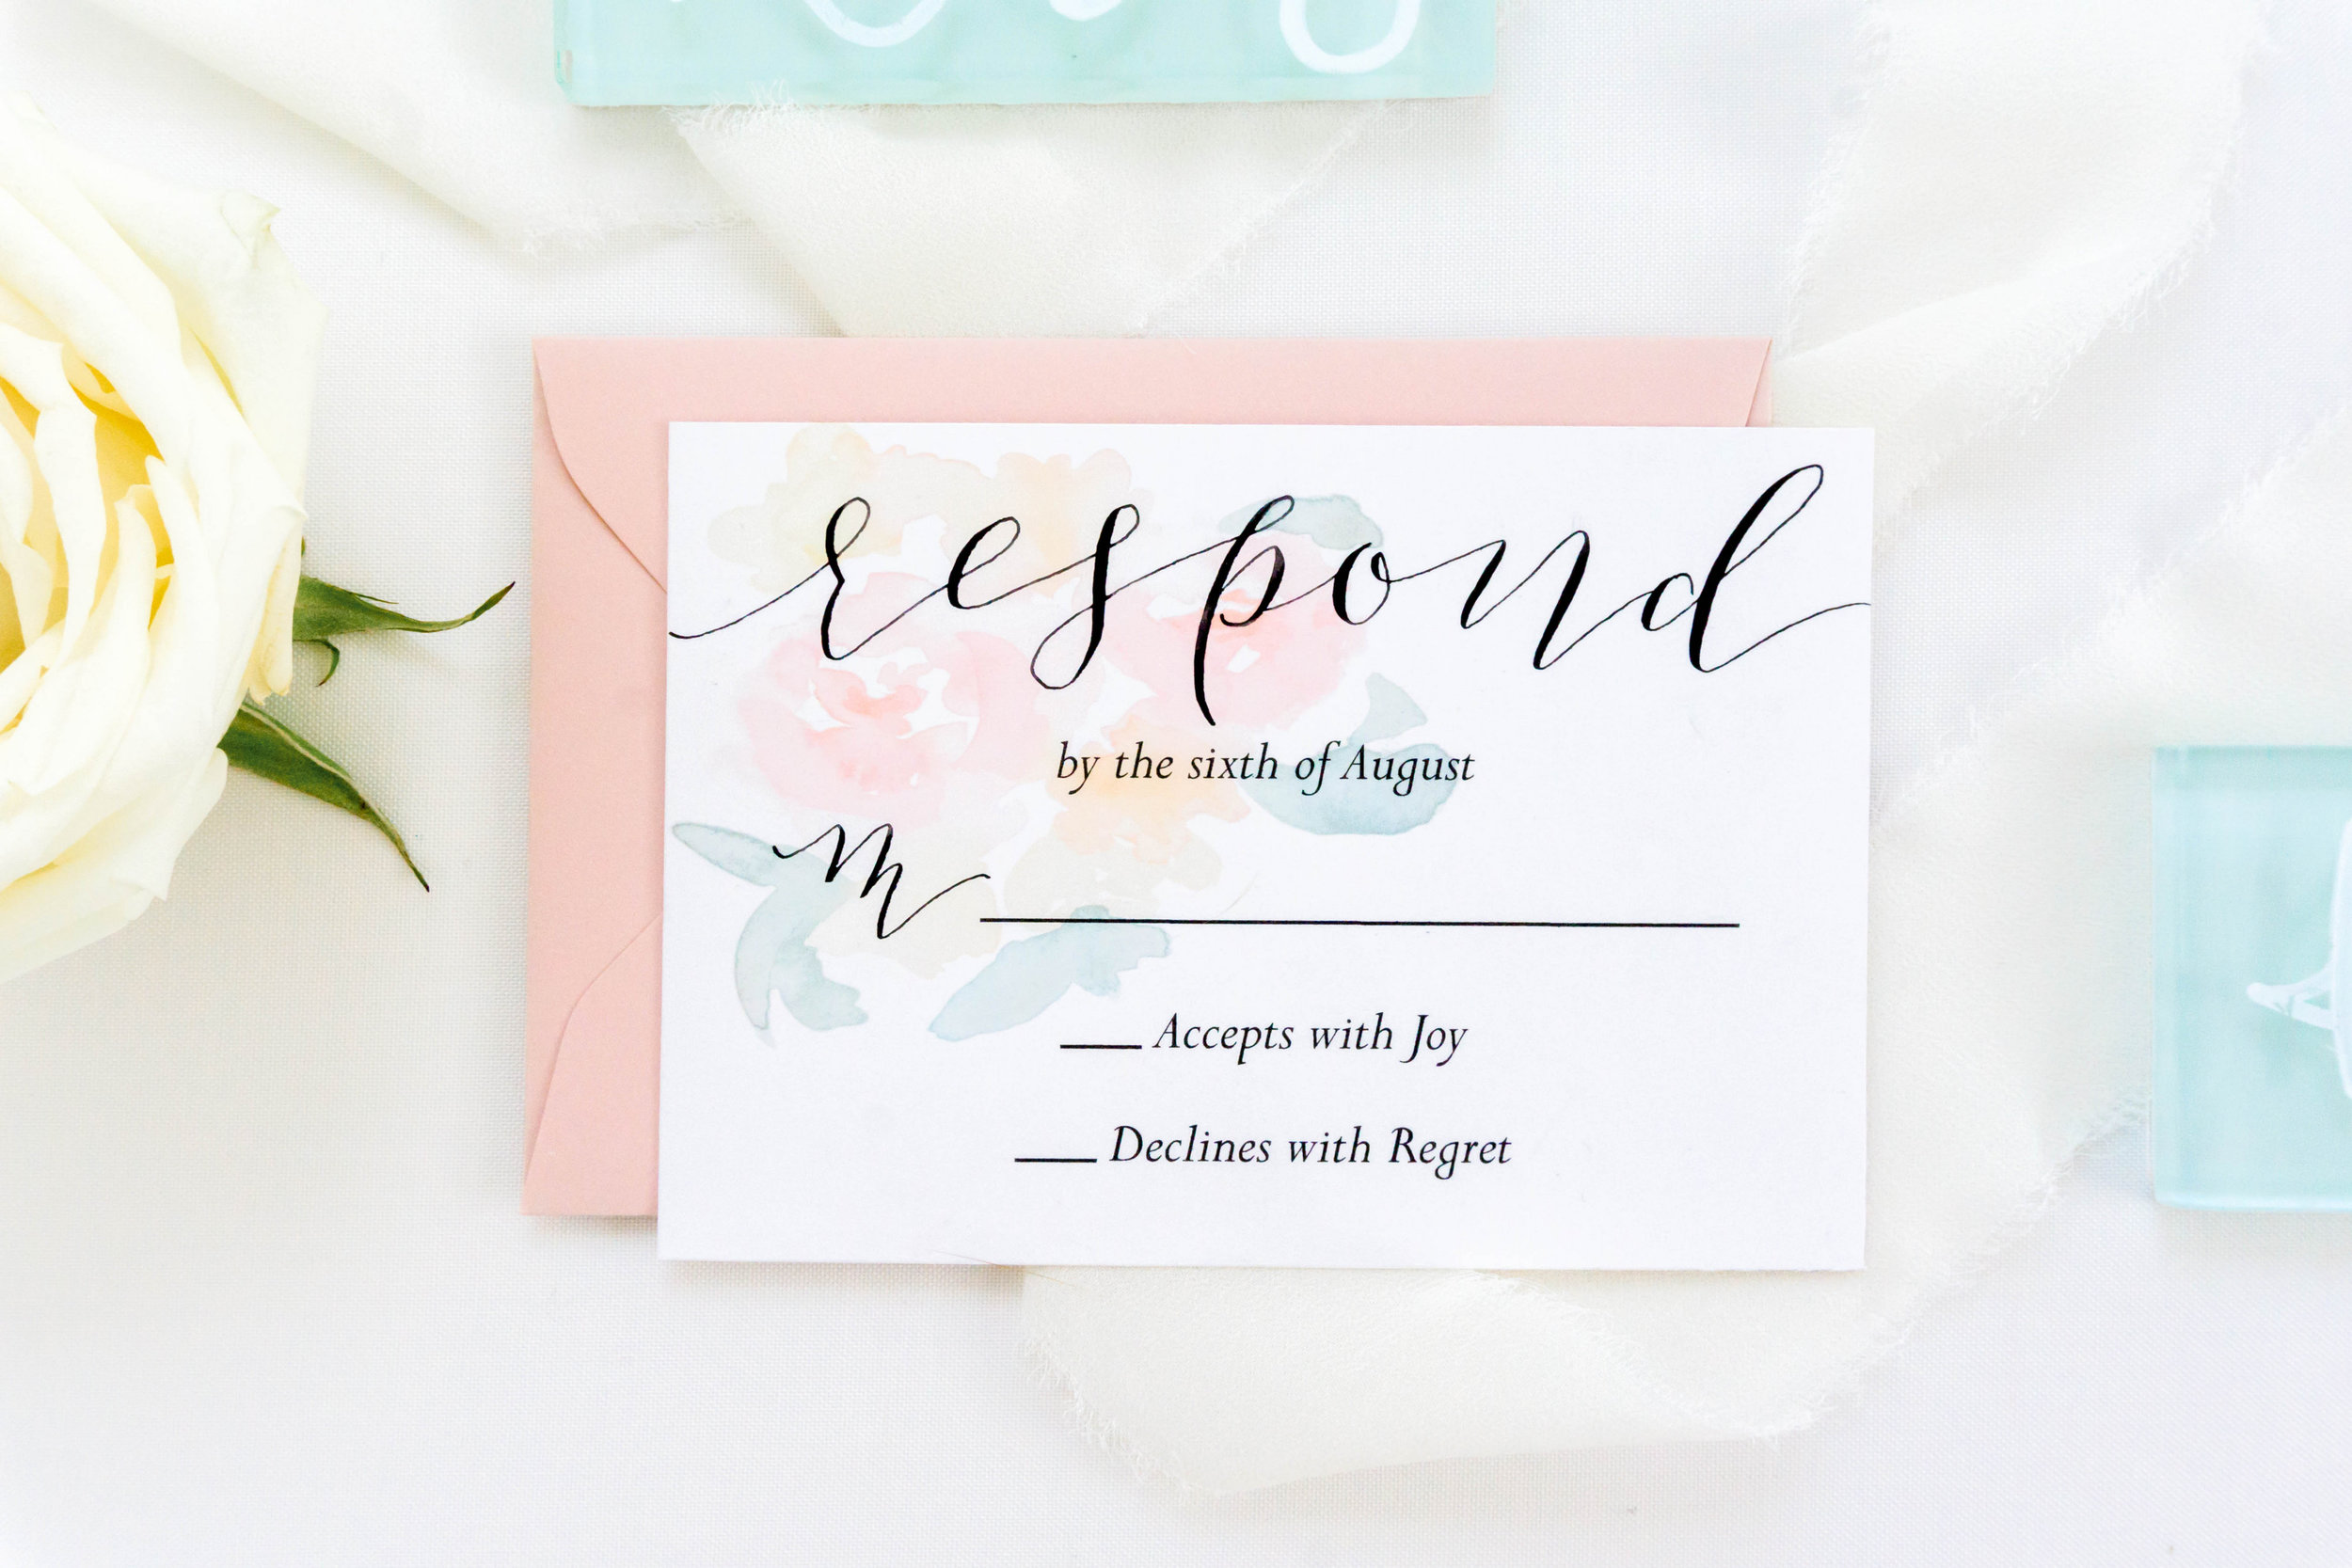 love-fern-design-studio-custom-wedding-invitations-for-the-modern-couple-modern-calligraphy-in-seattle-washington-custom-wedding-stationery-light-pink-watercolor-floral-rsvp-card